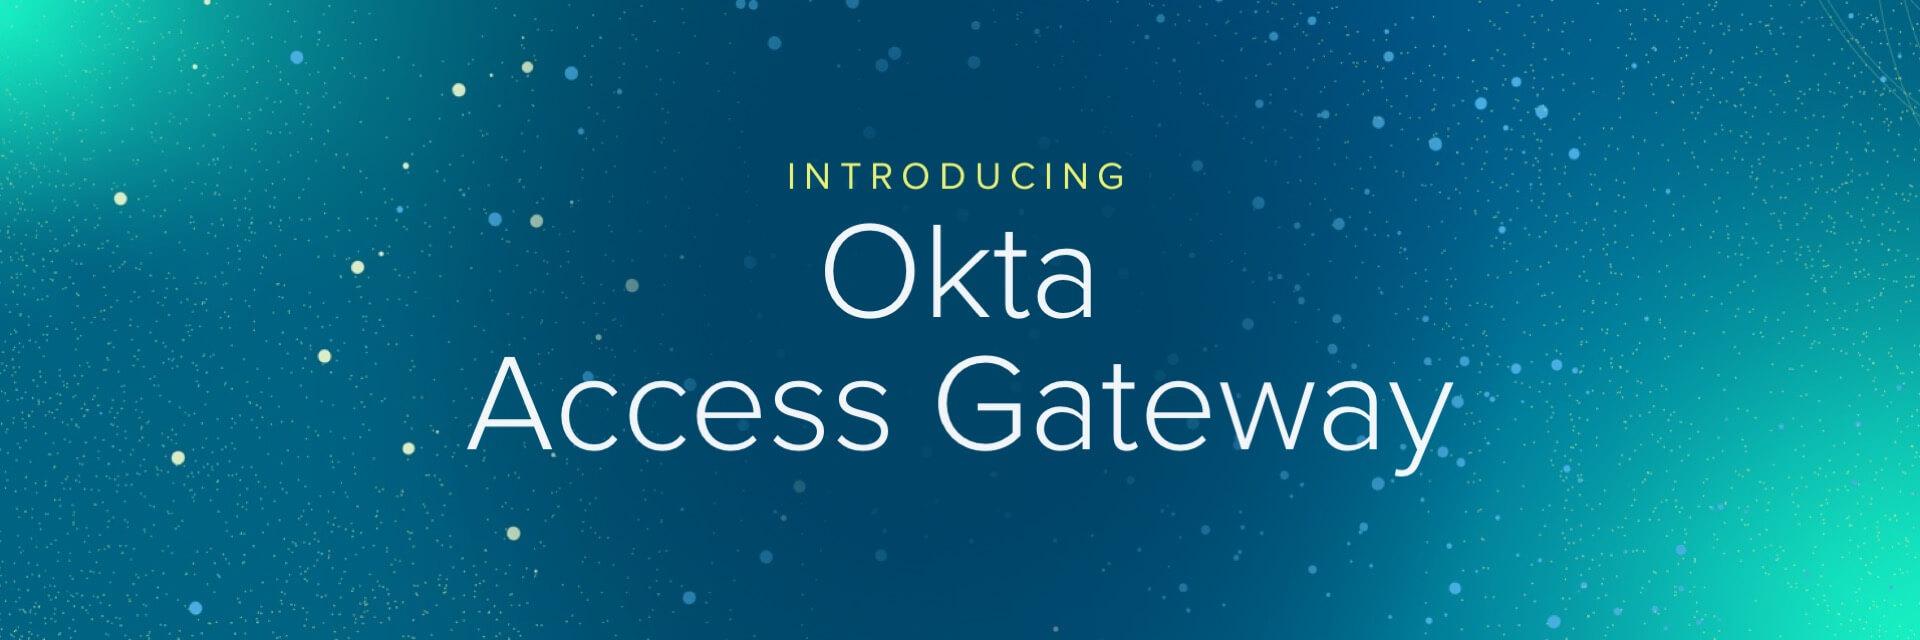 Okta Access Gateway Blog Post